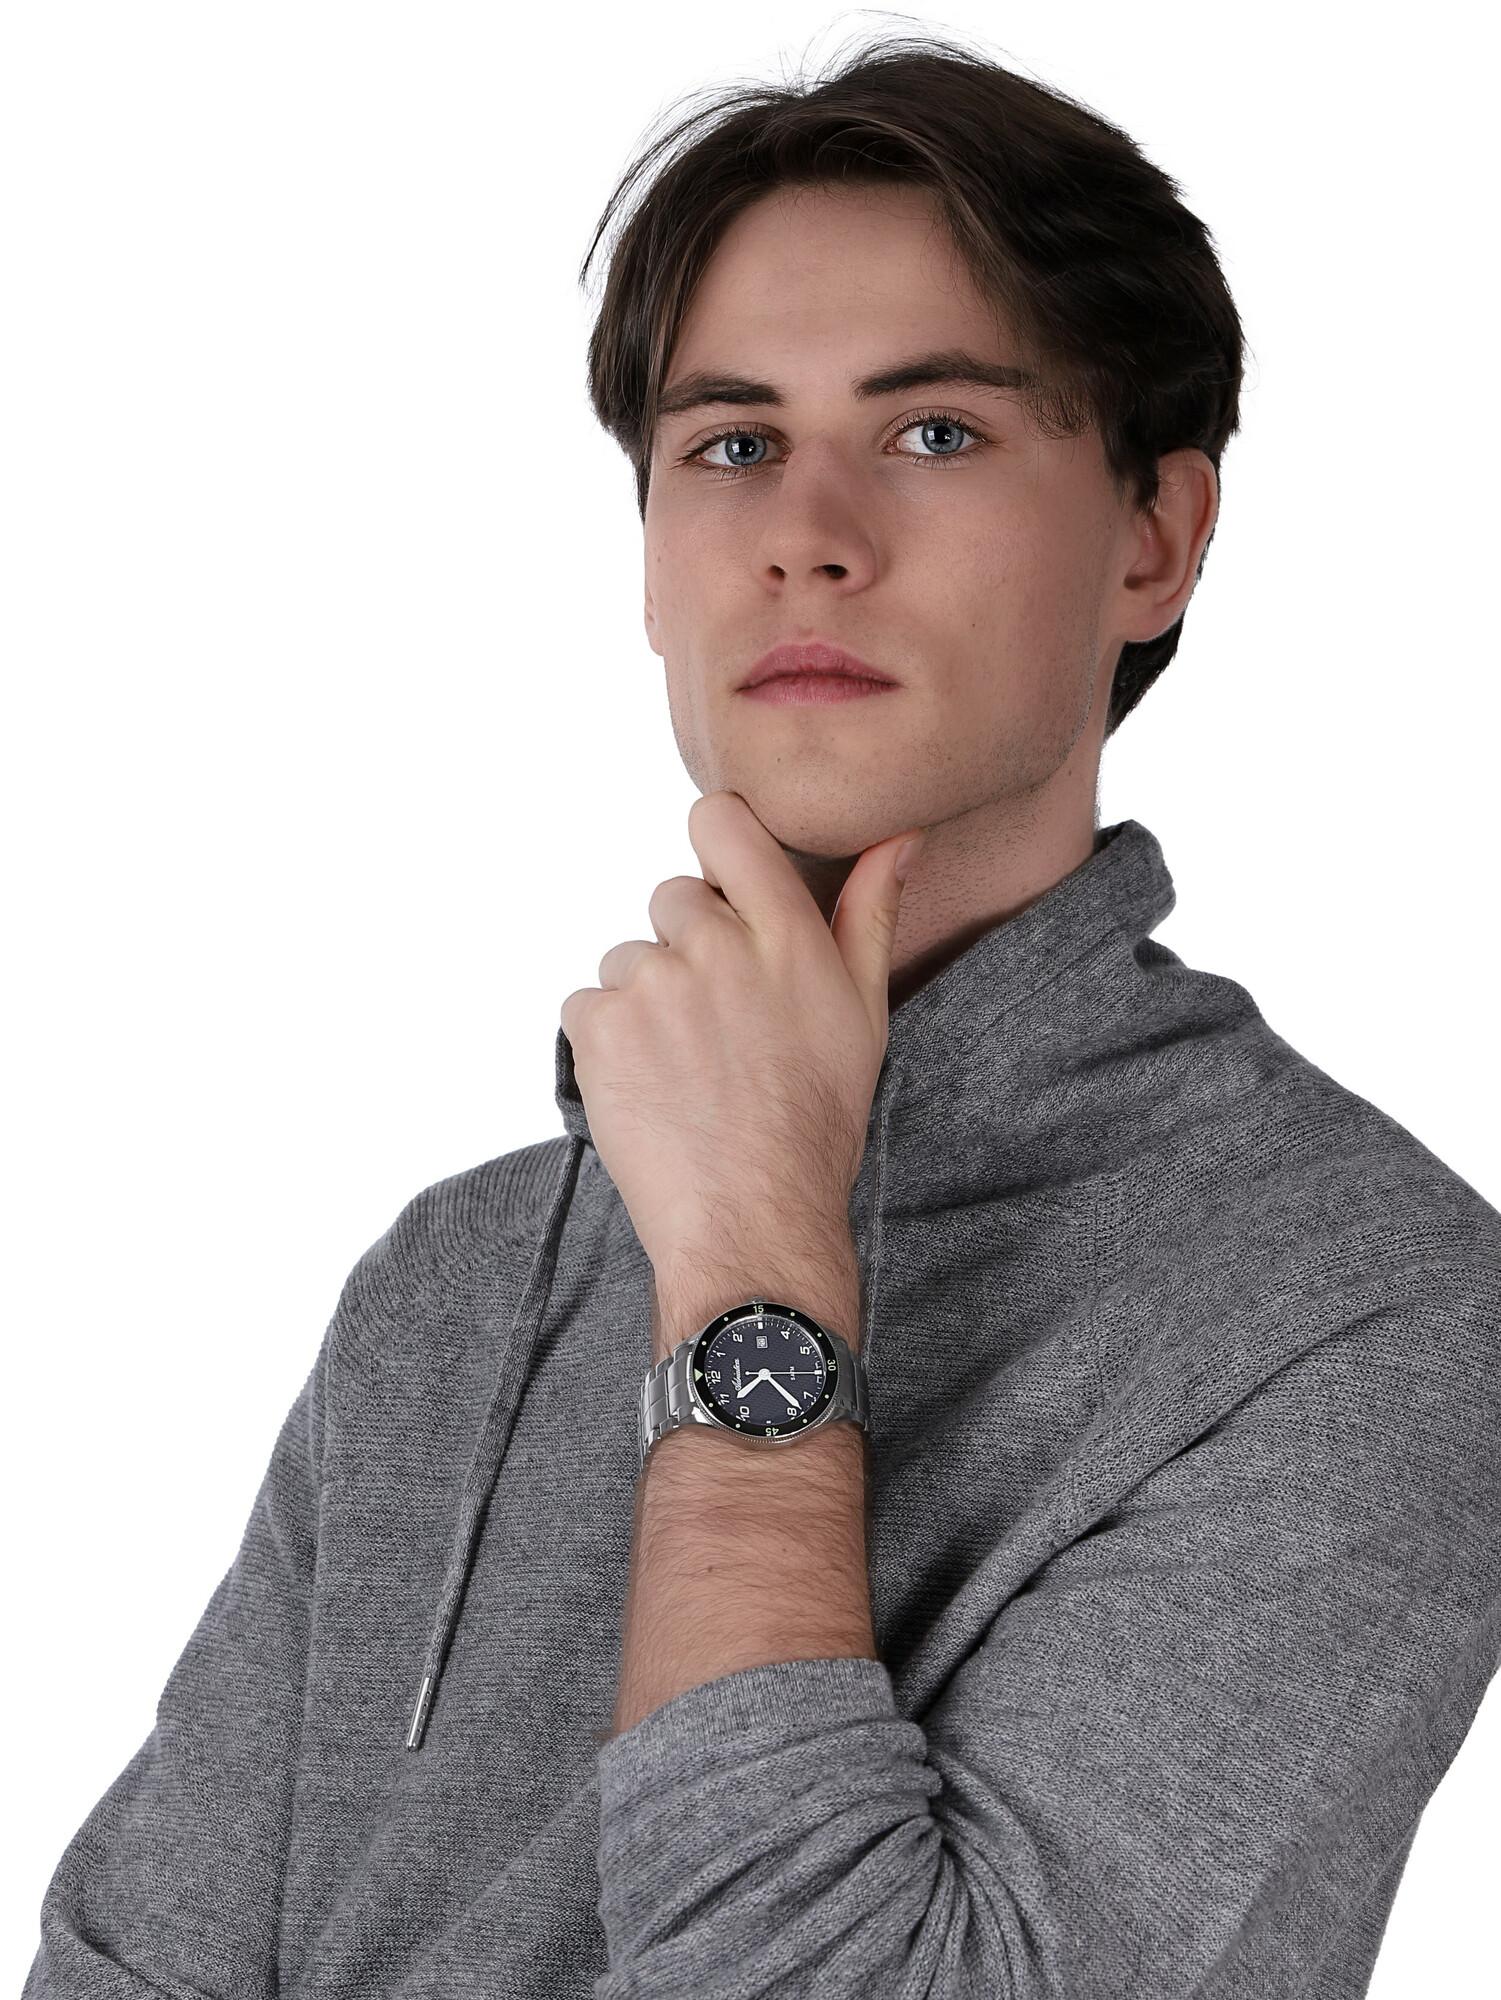 Adriatica A8322.5124Q zegarek srebrny klasyczny Bransoleta bransoleta